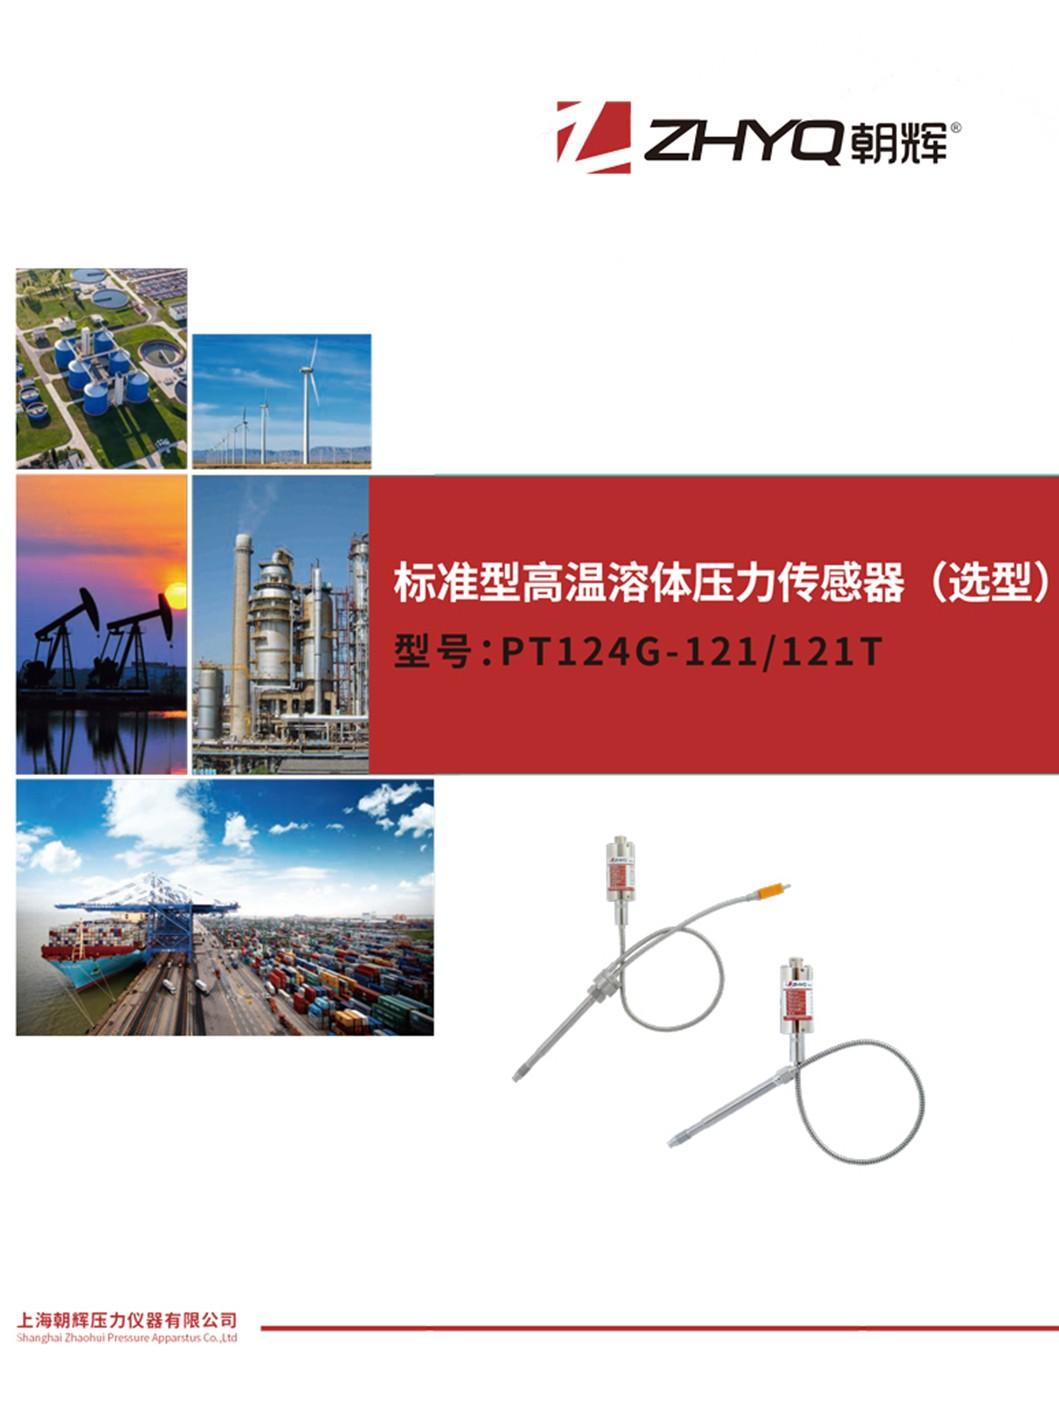 PT124G-121 标准型高温熔体压力传感器(选型)_上海朝辉